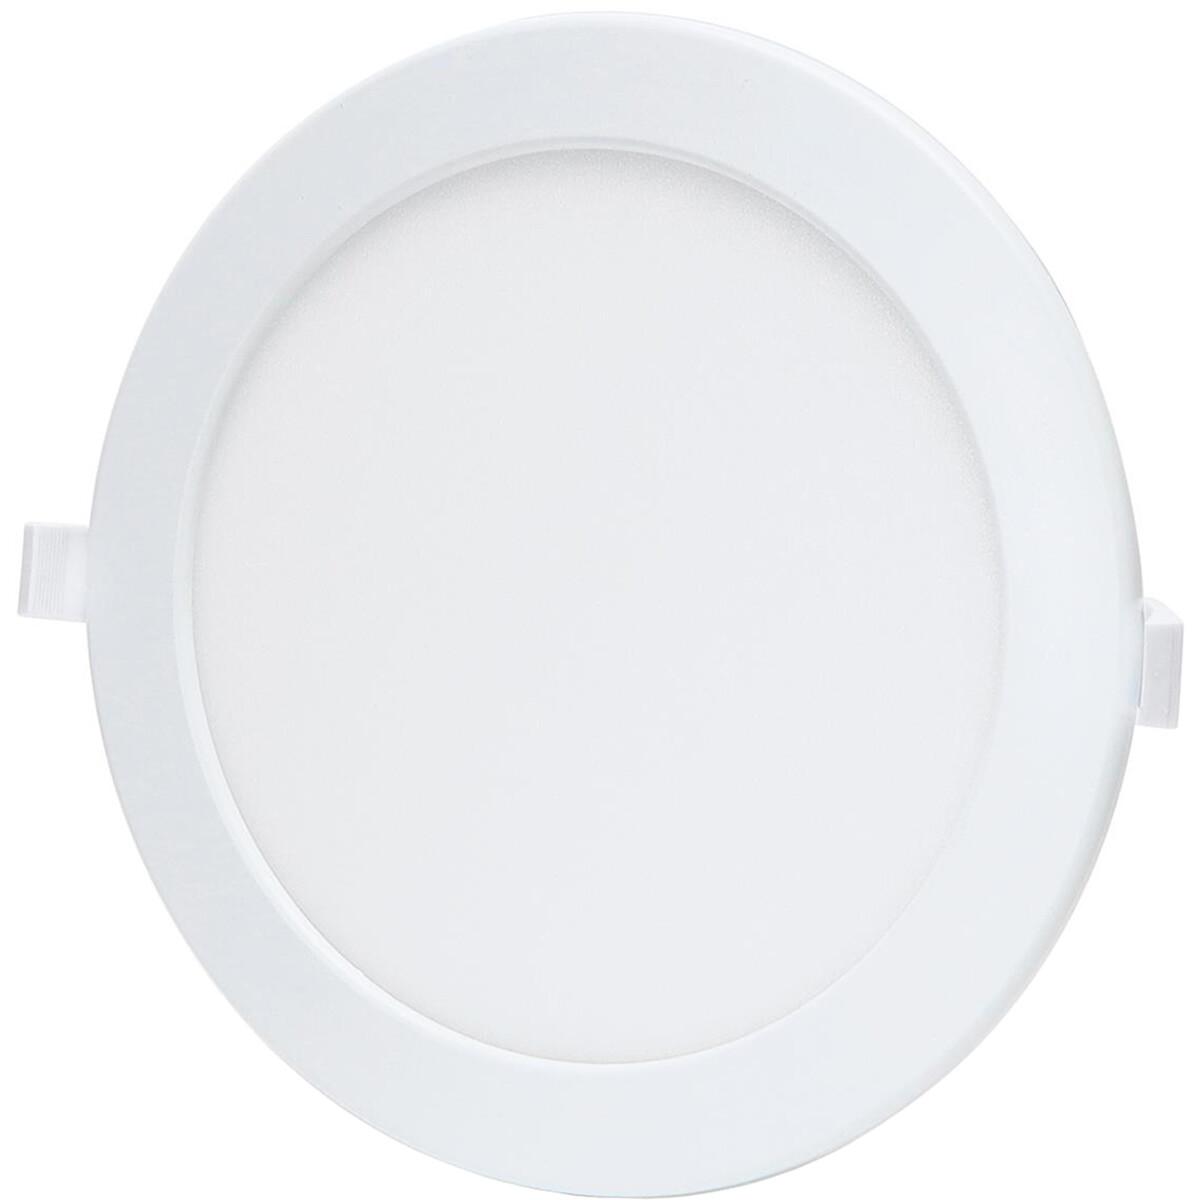 LED Downlight - Smart LED - Aigi Zumba - 18W - Aanpasbare Kleur - Inbouw Rond - Mat Wit - Aluminium